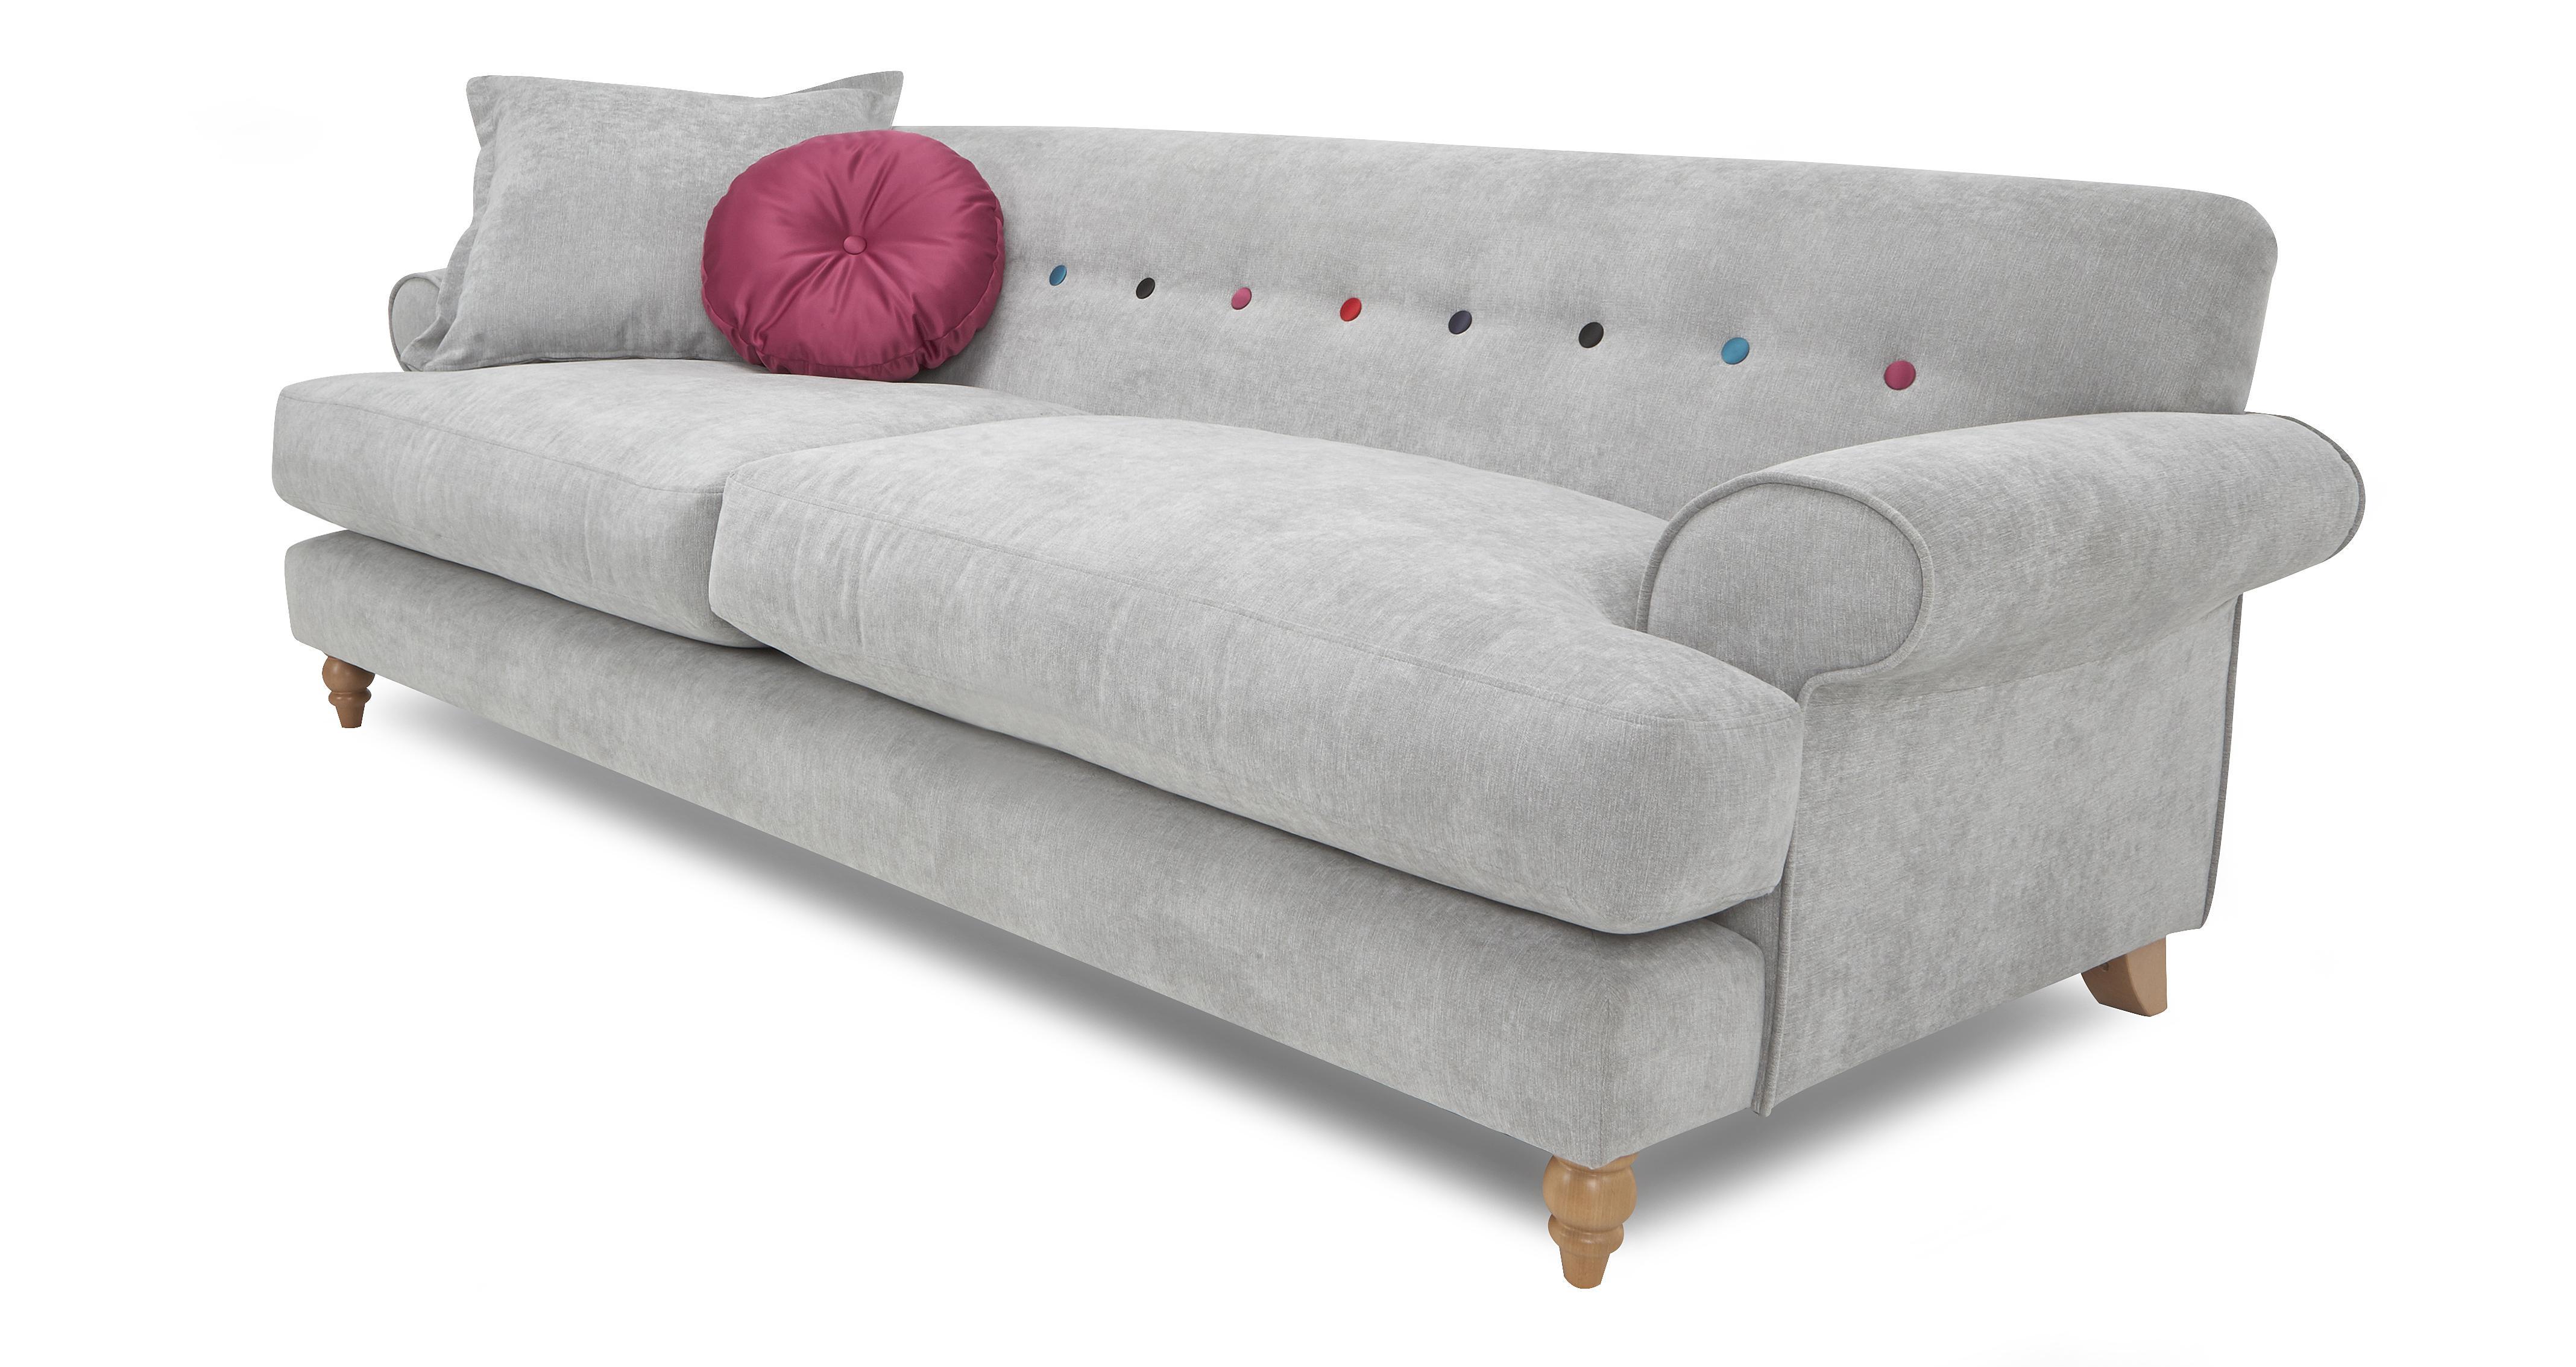 sofa 4 seater surefit textured linen one piece slipcover dress womens clothing four sofas